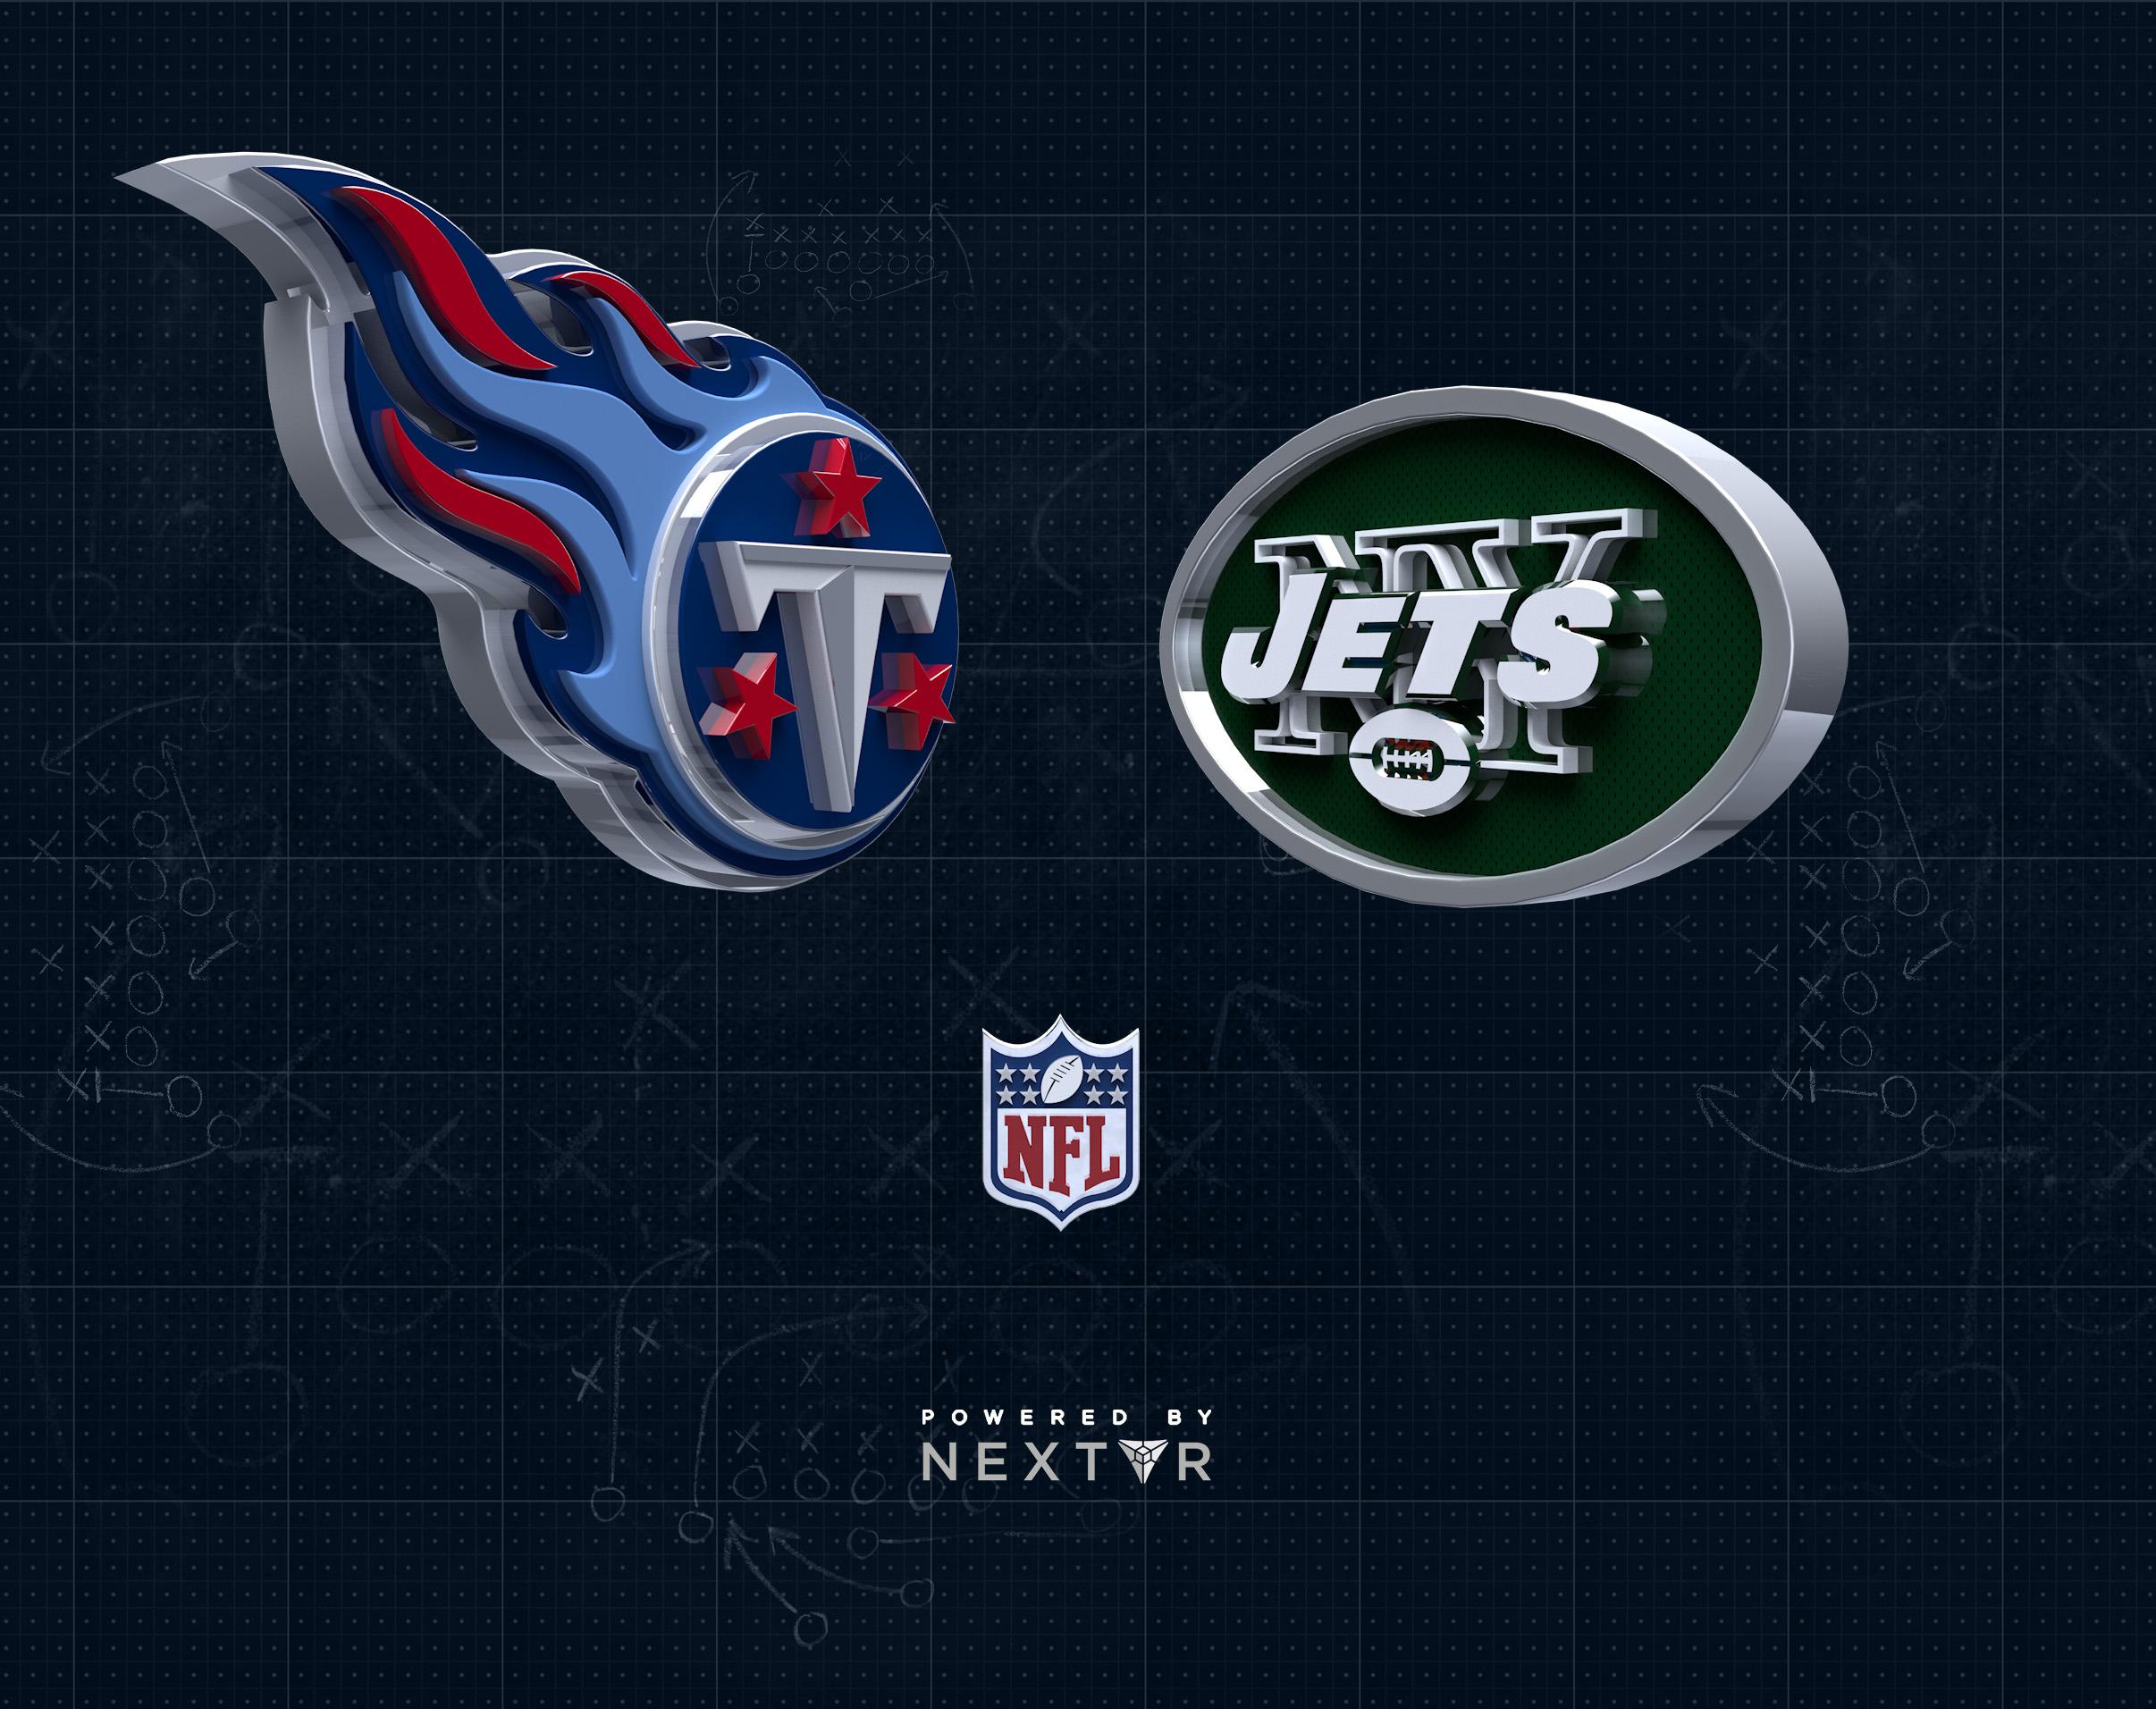 NFL_TitansVJets_BackplaceMockup